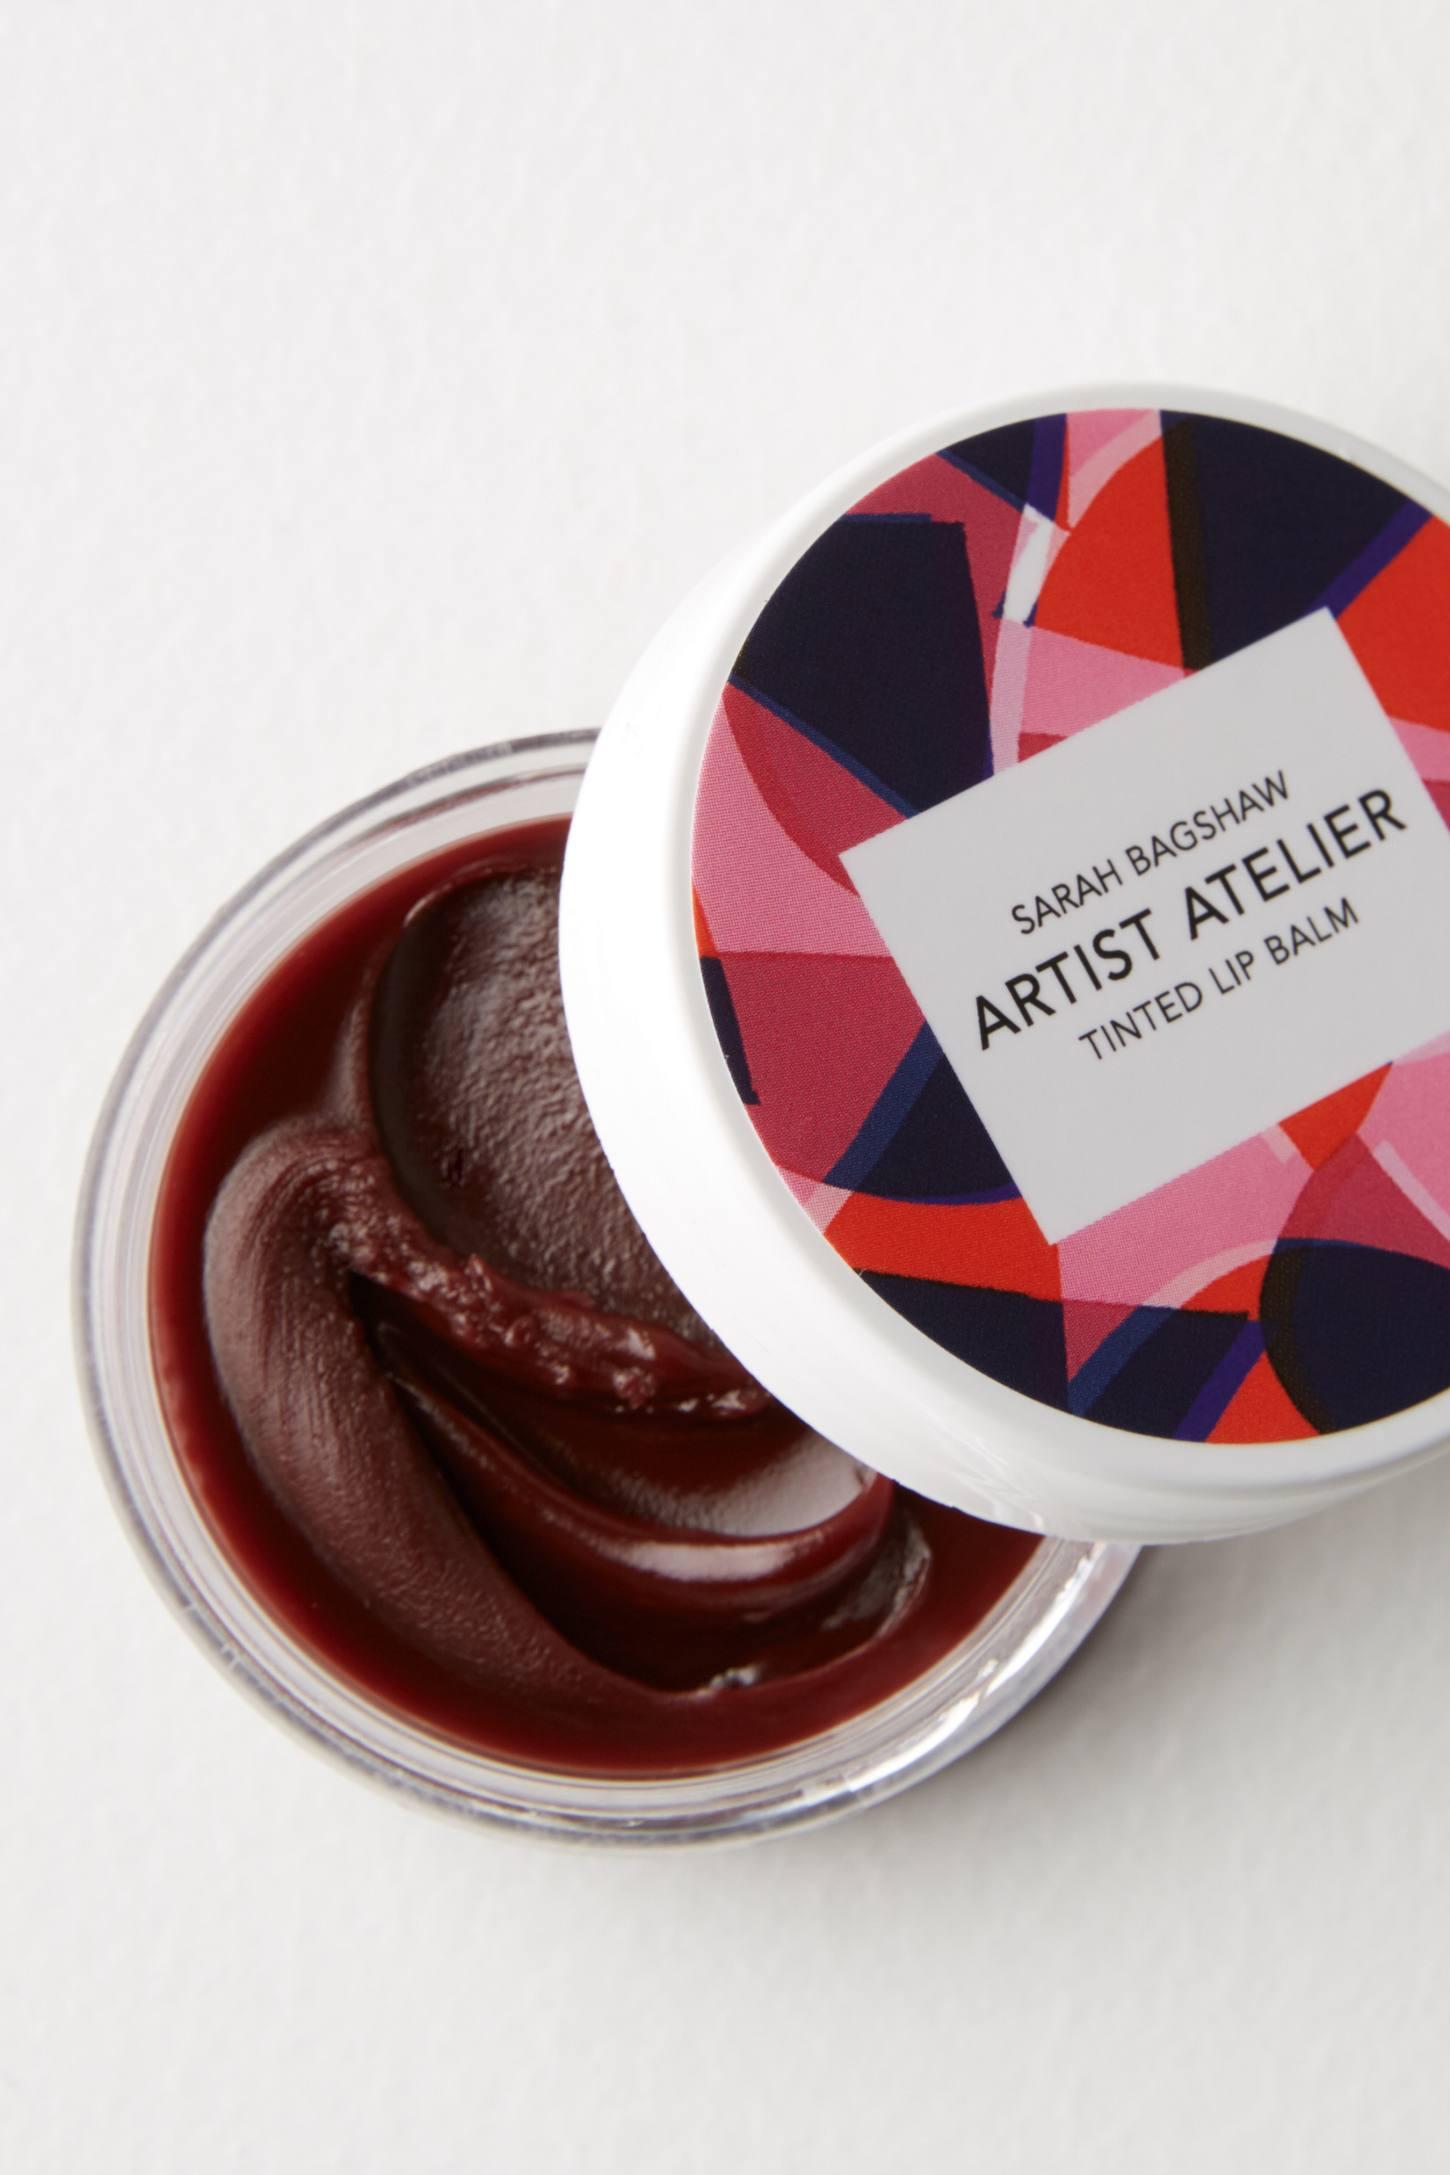 Image result for sarah bagshaw tinted lip balm